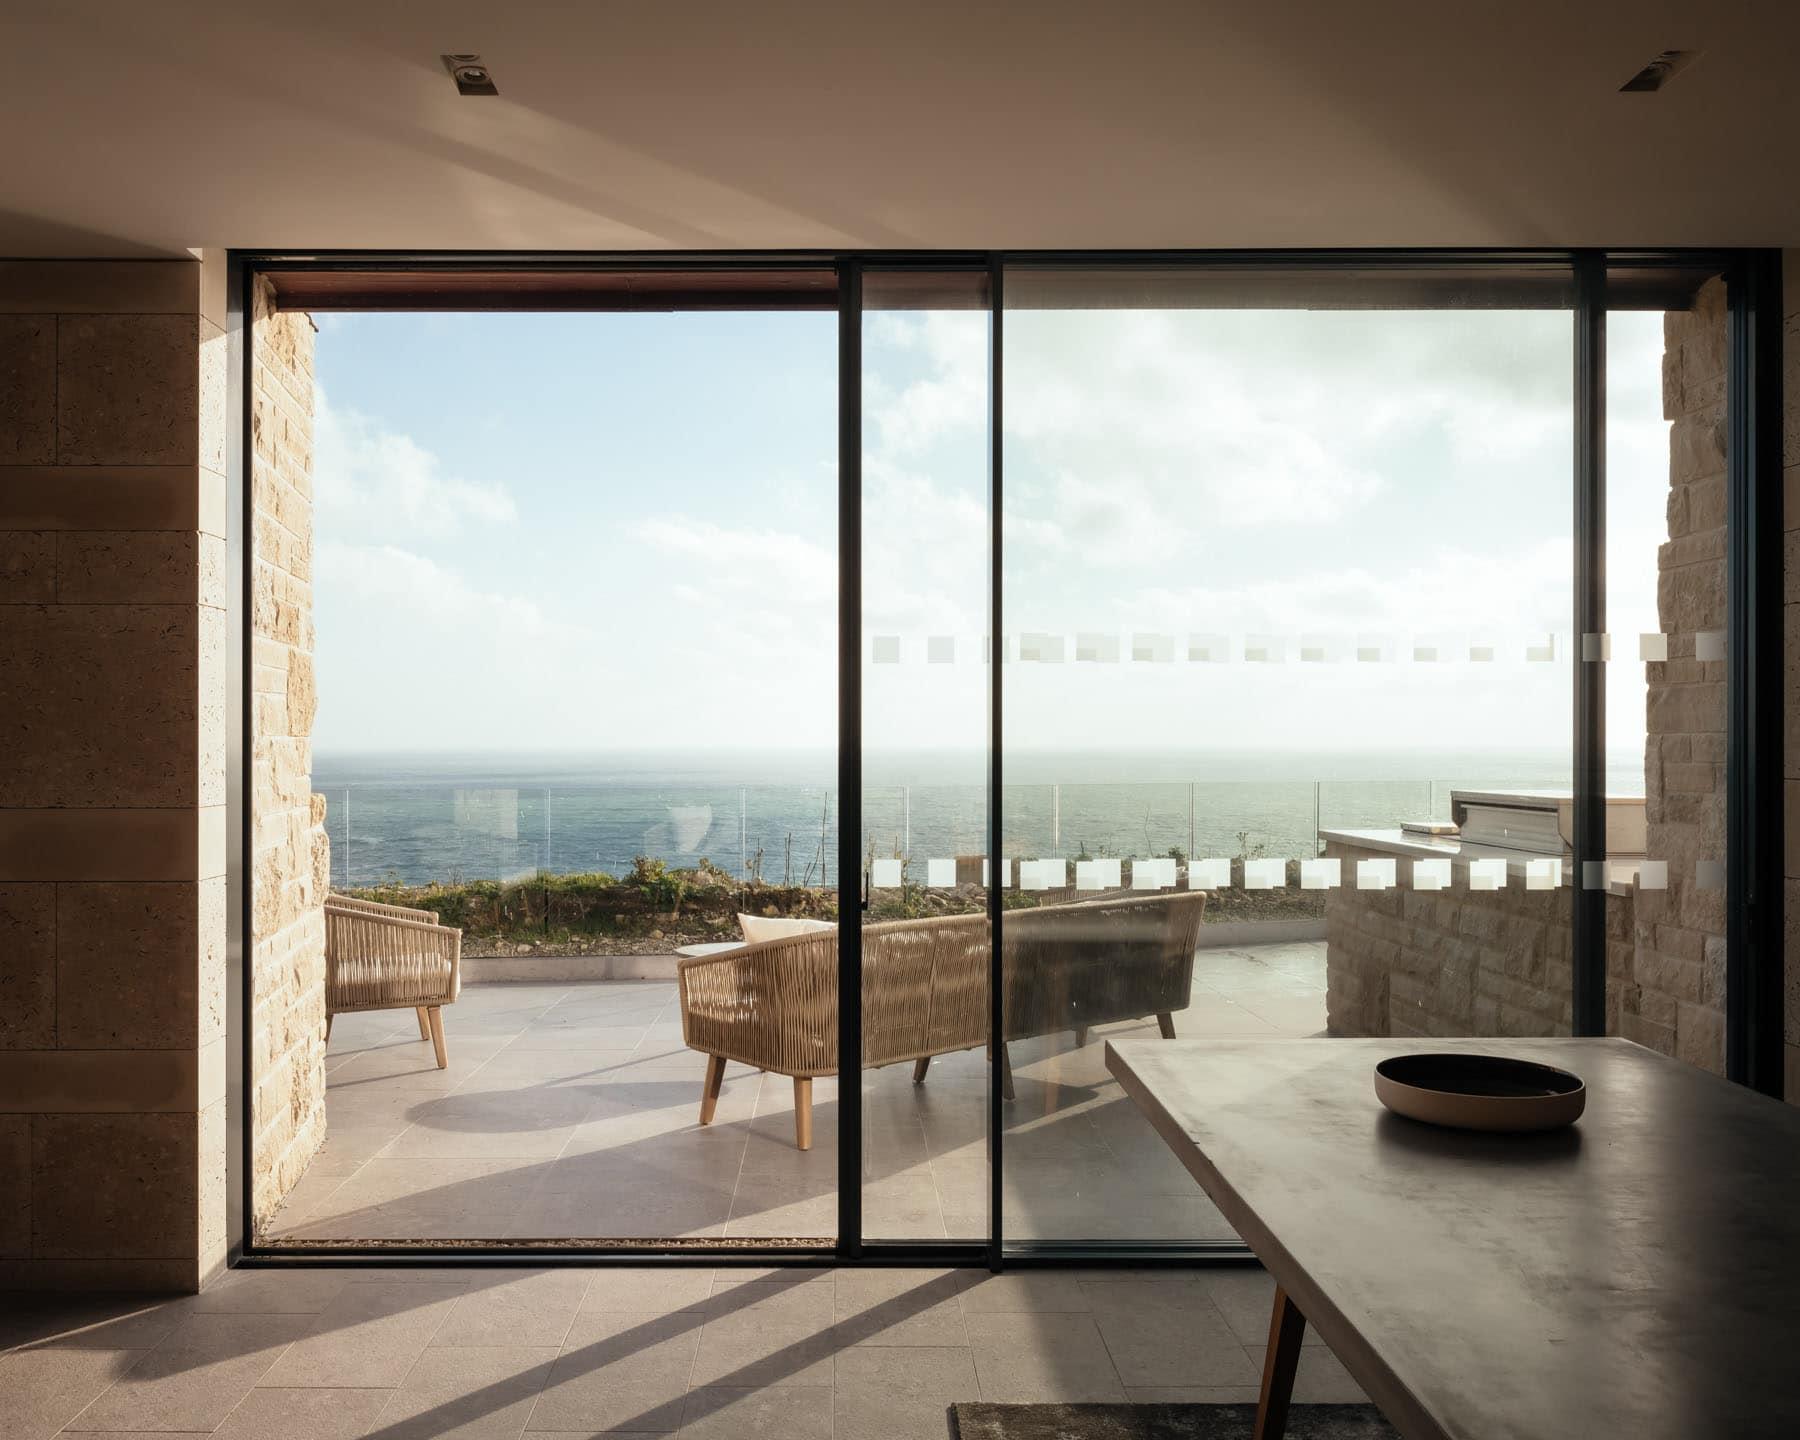 Slim framed sliding door systems link coastal holiday home with balcony